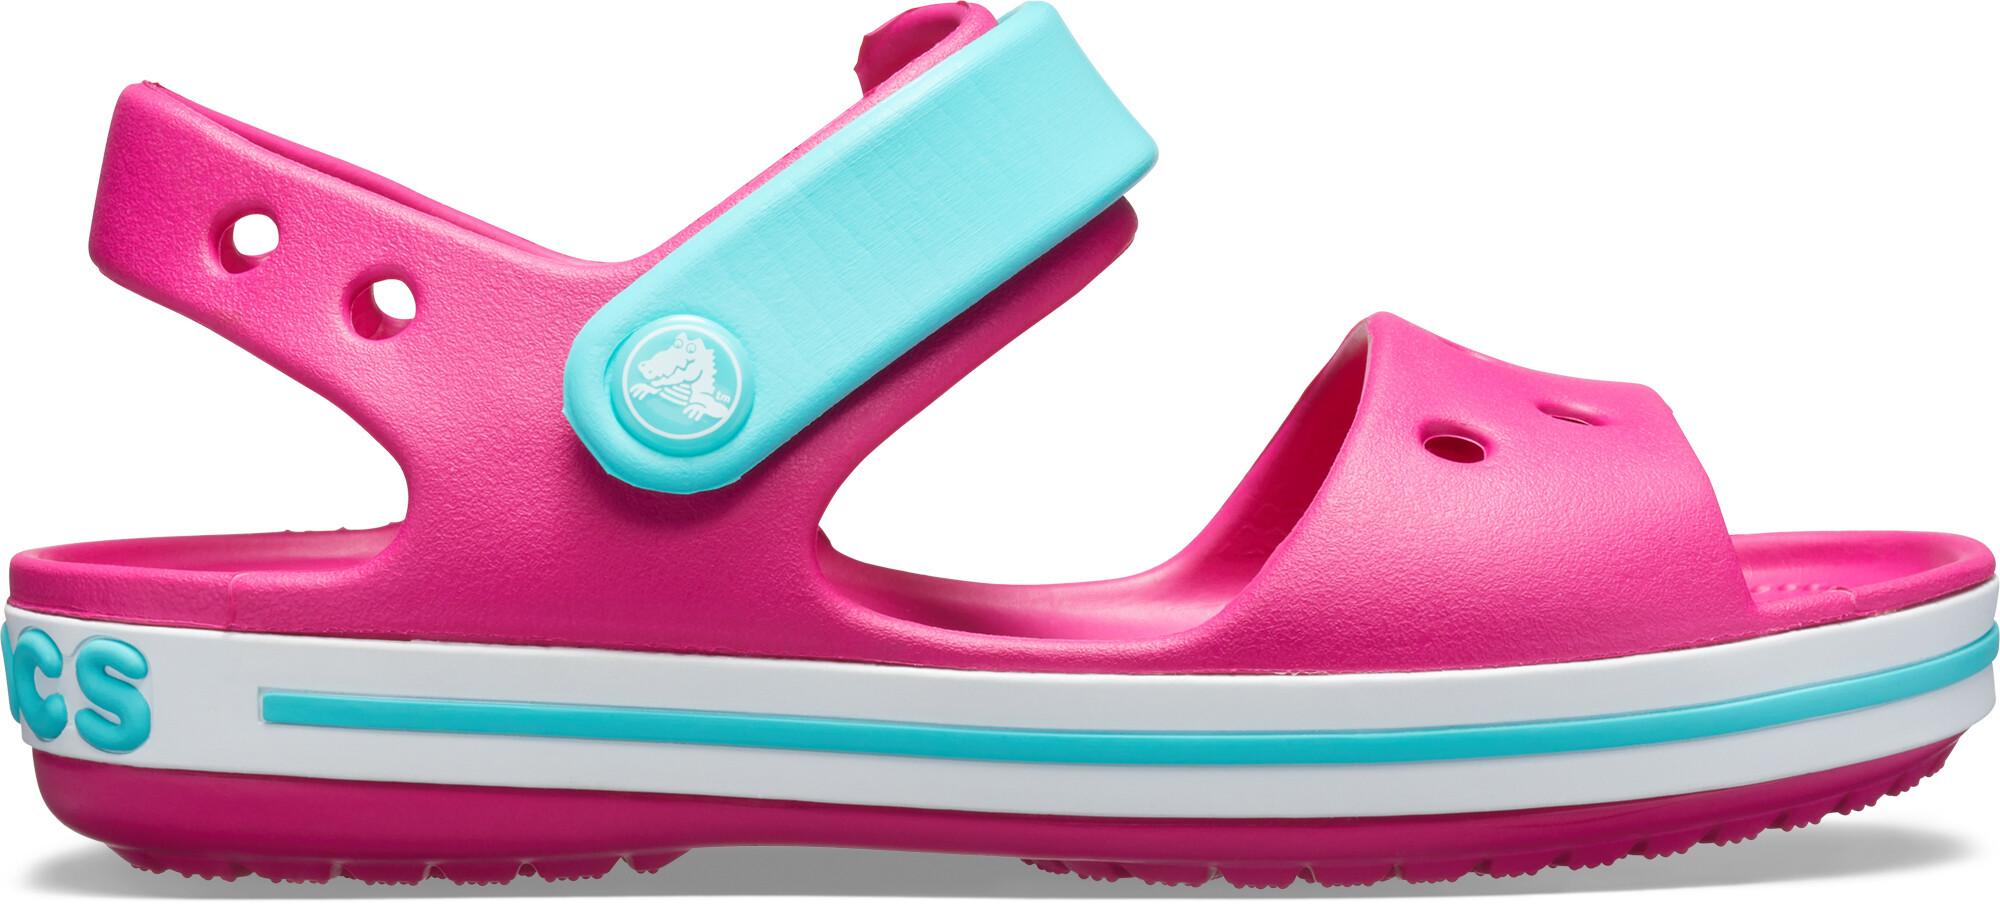 ebeabbce42fc Crocs Crocband Sandals Kids